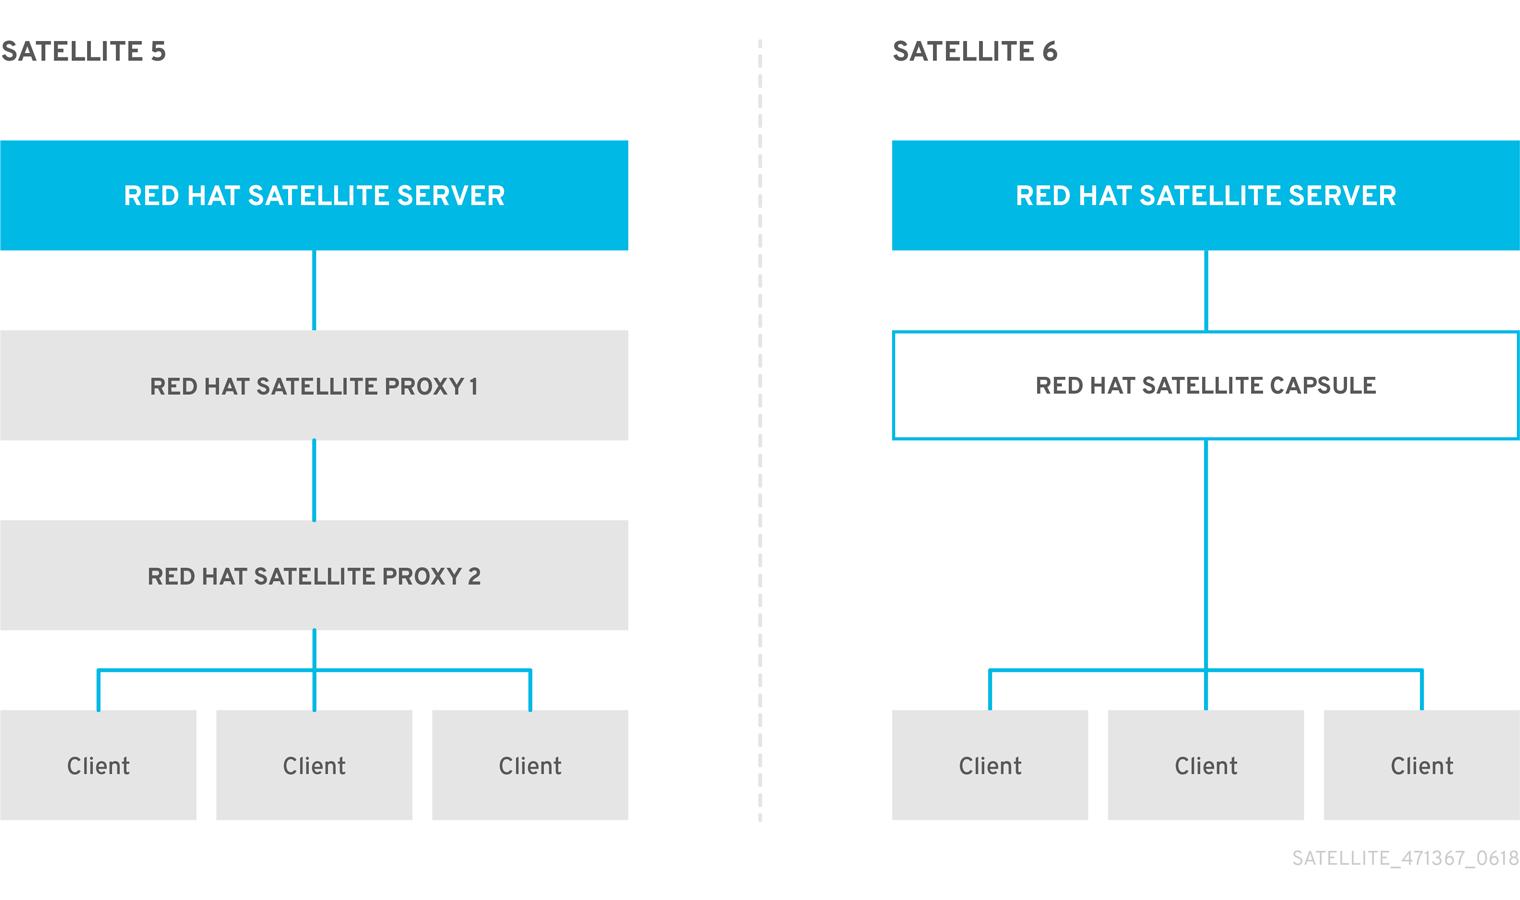 Comparison of Satellite5 Proxy and Satellite6 Capsule Servers